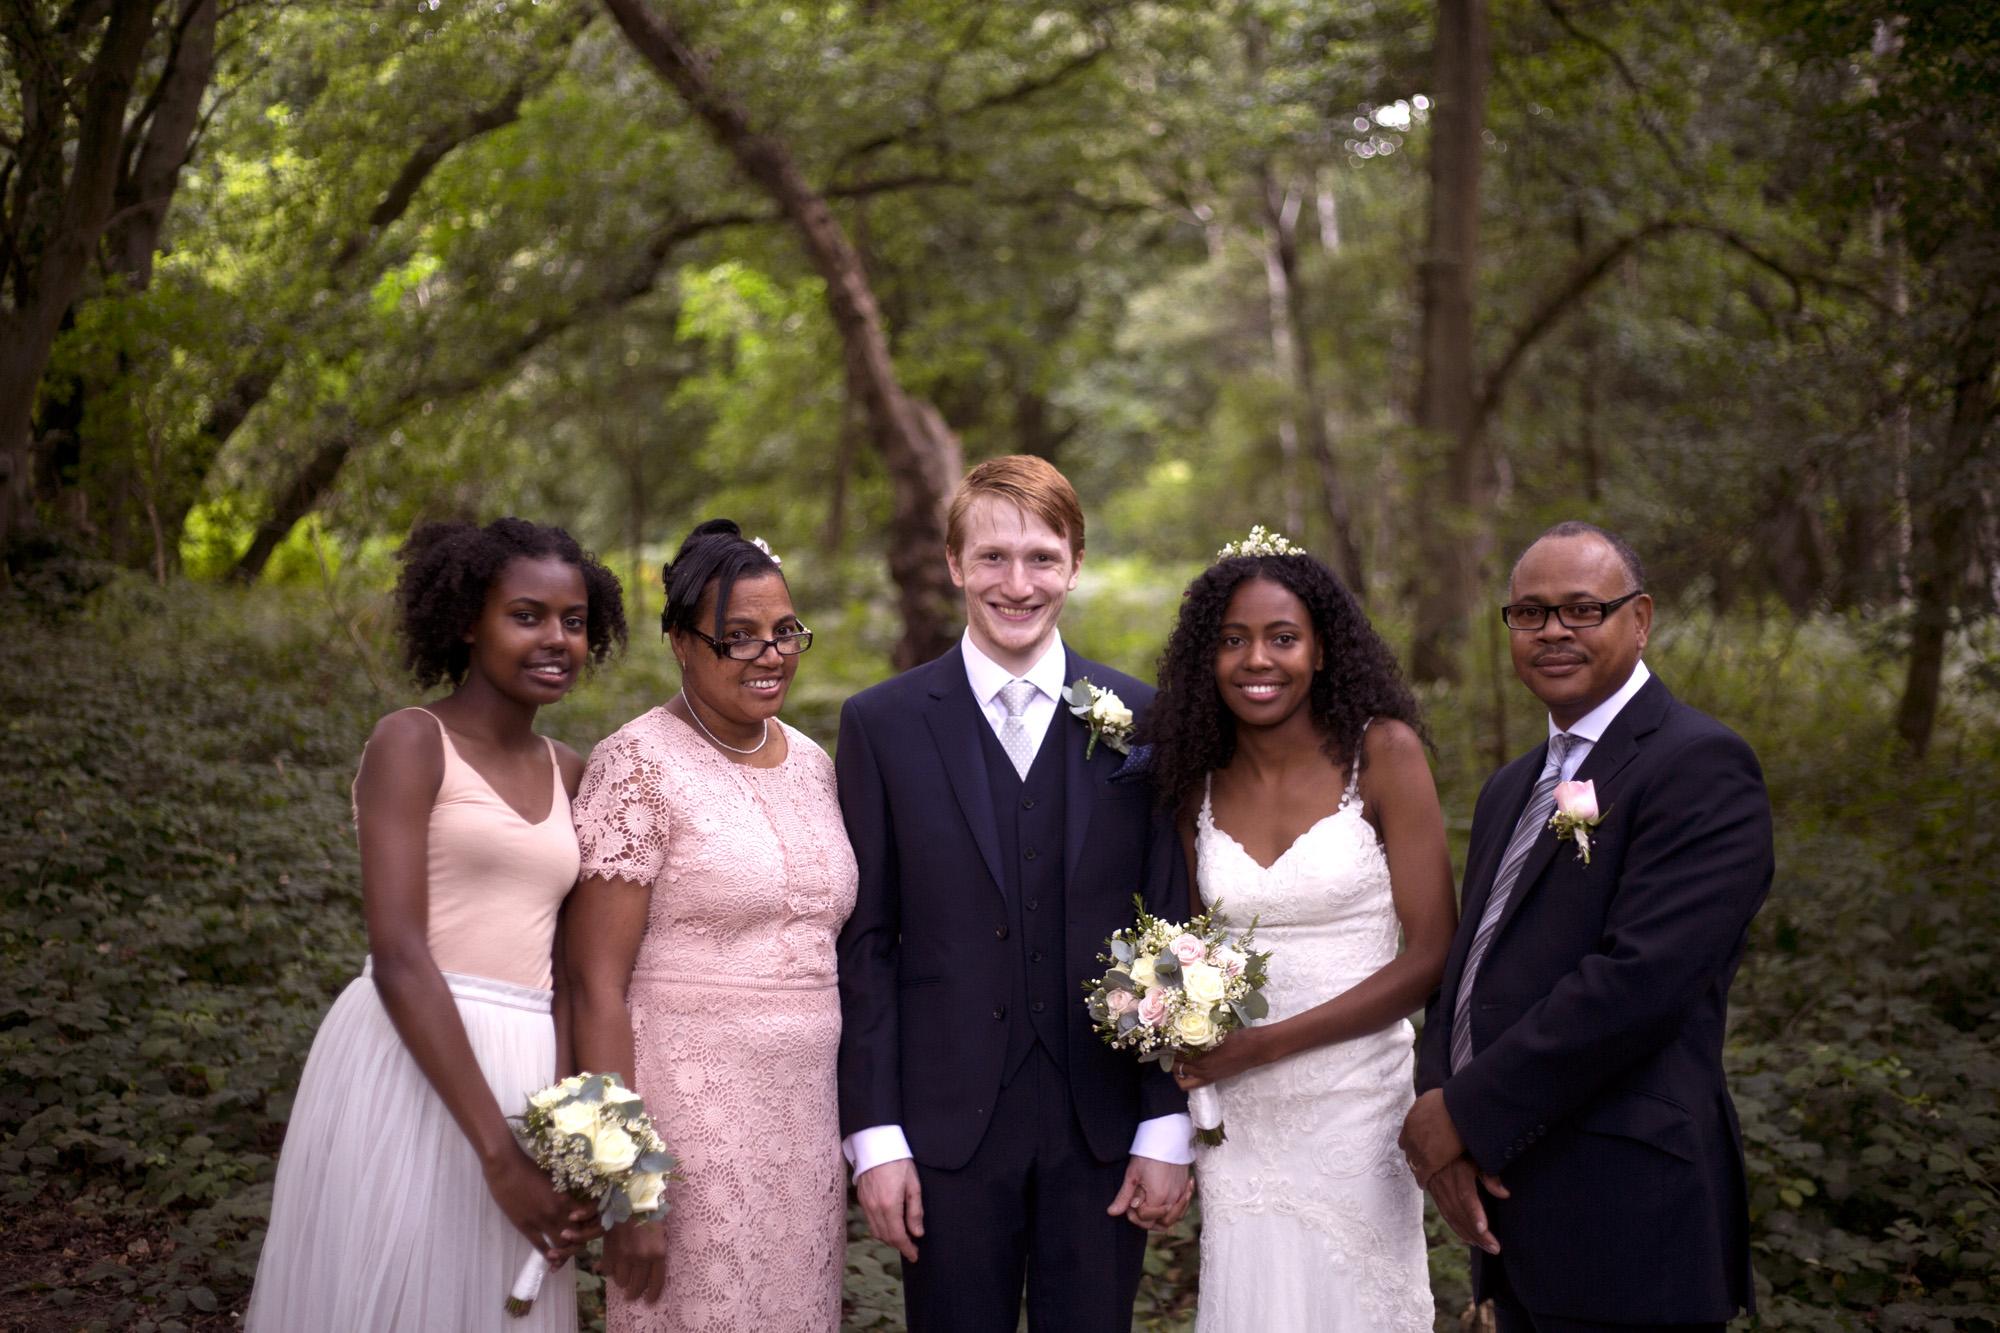 Family portrait pinks and blues woodland wedding photographer